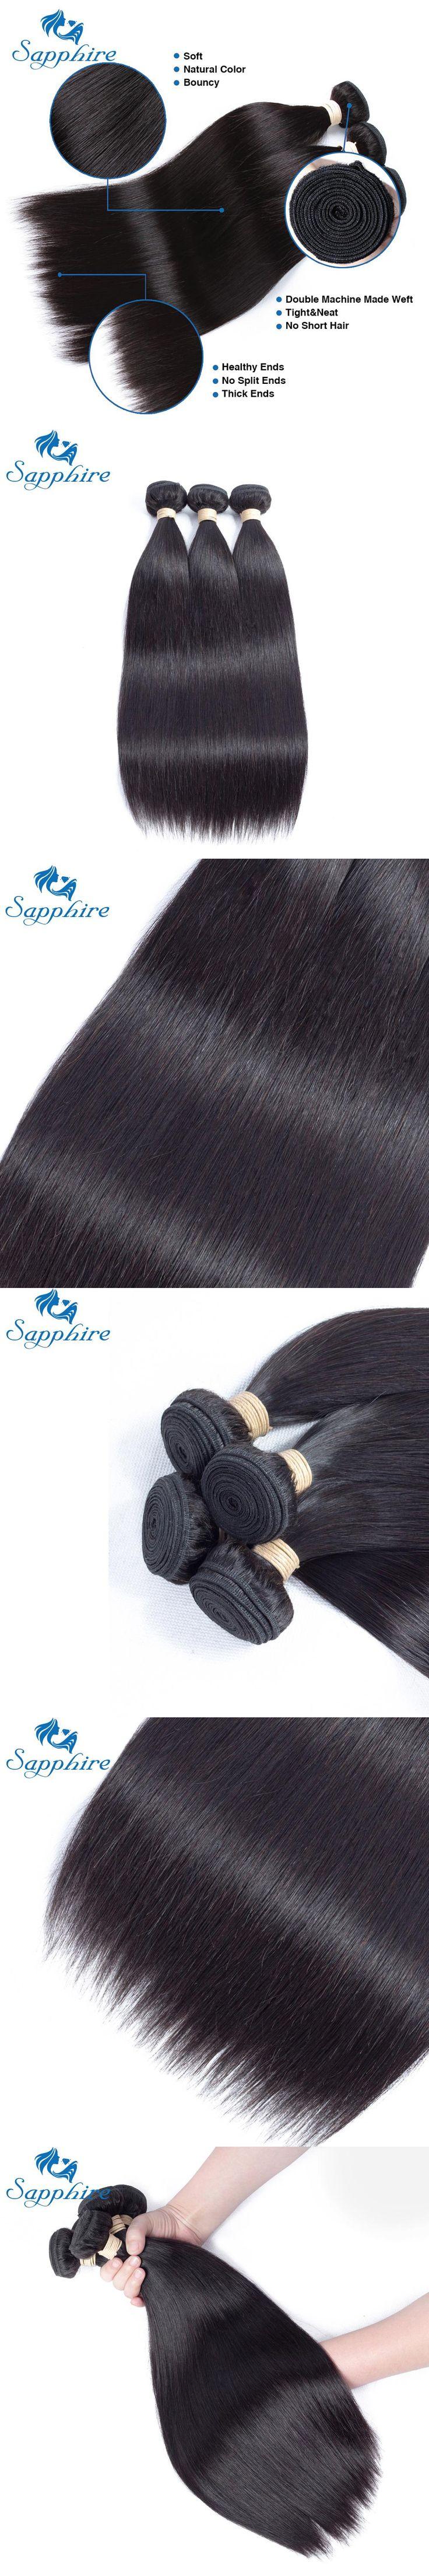 Sapphire Remy Hair Human Hair 3 Bundles Brazilian Straight Hair Weave 2Pieces Natural Color Brazilian Hair Weaving Free Shipping